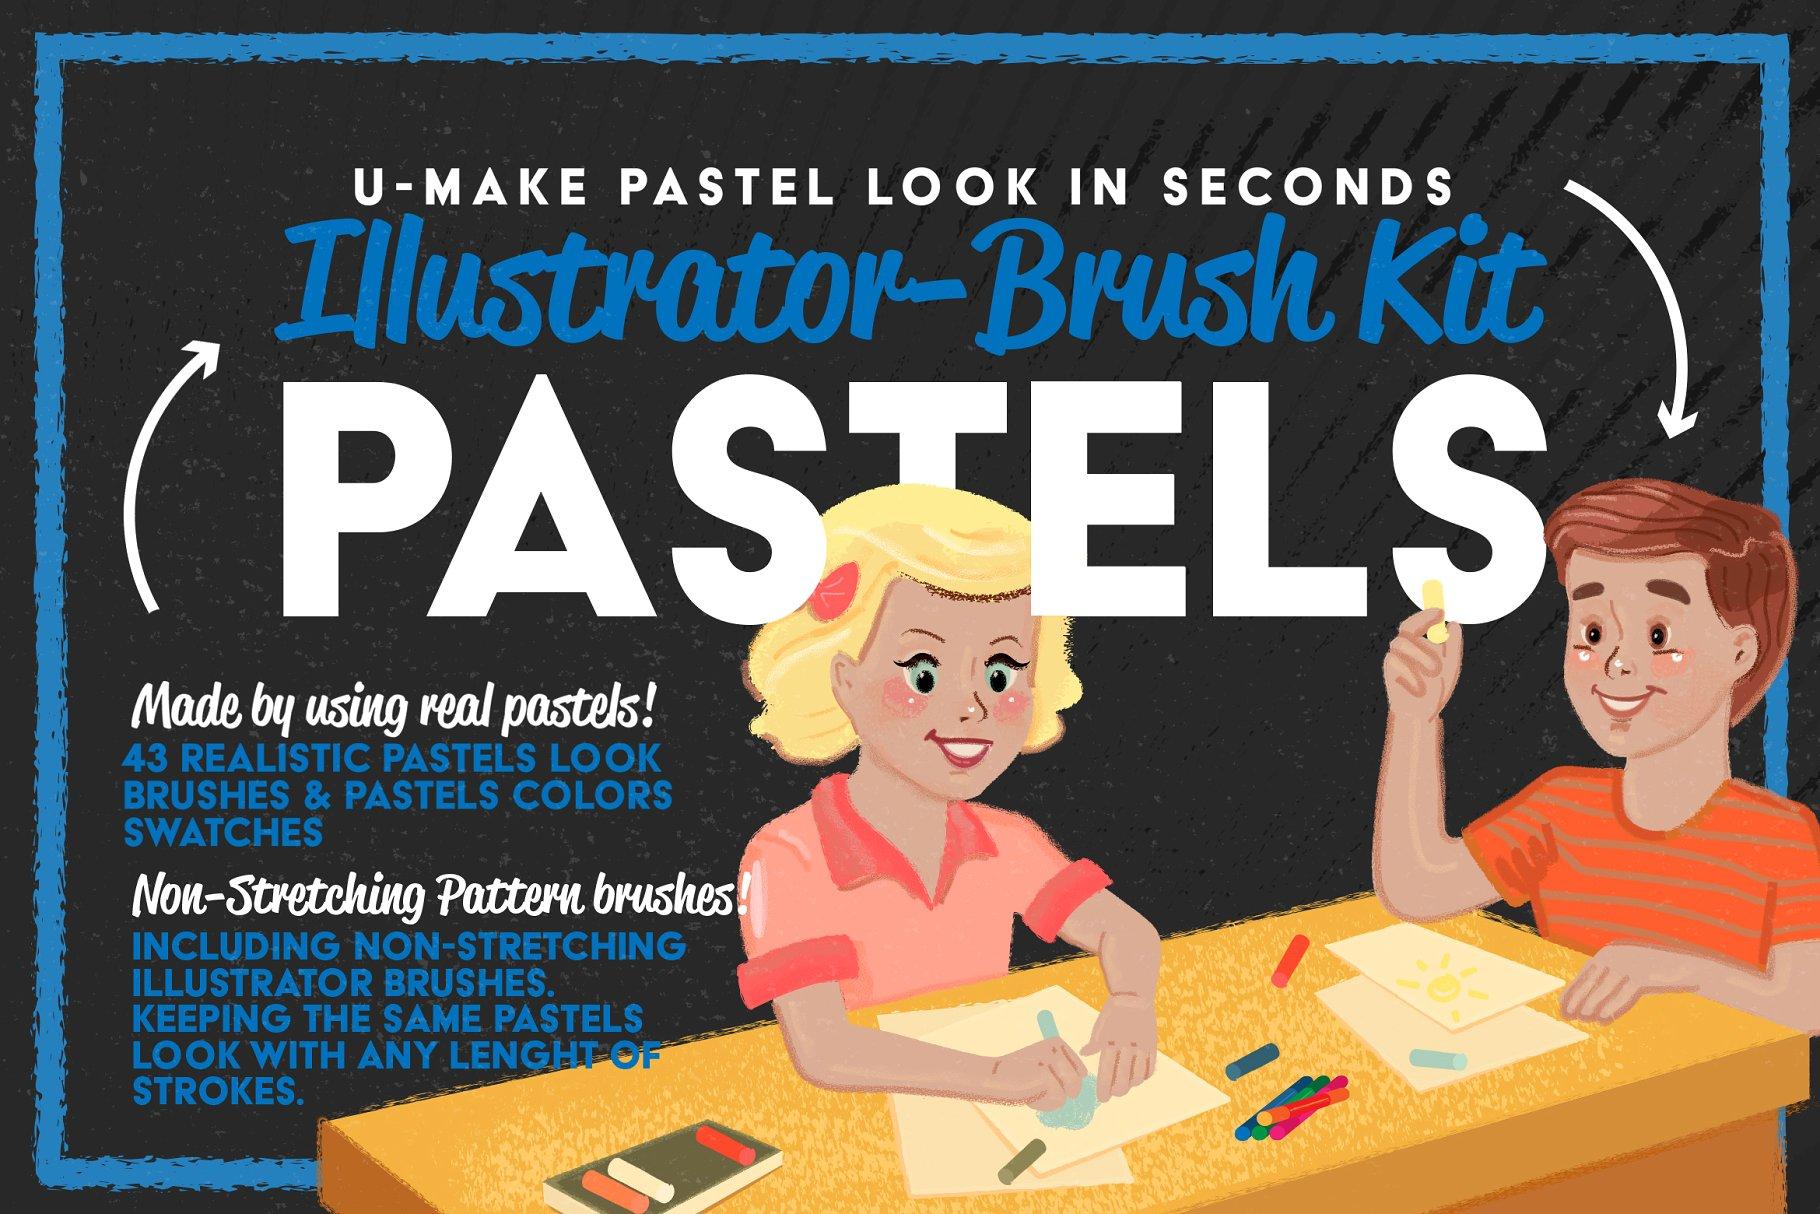 AI插画笔刷下载 Pastels Illustrator Brush-Kit设计素材模板